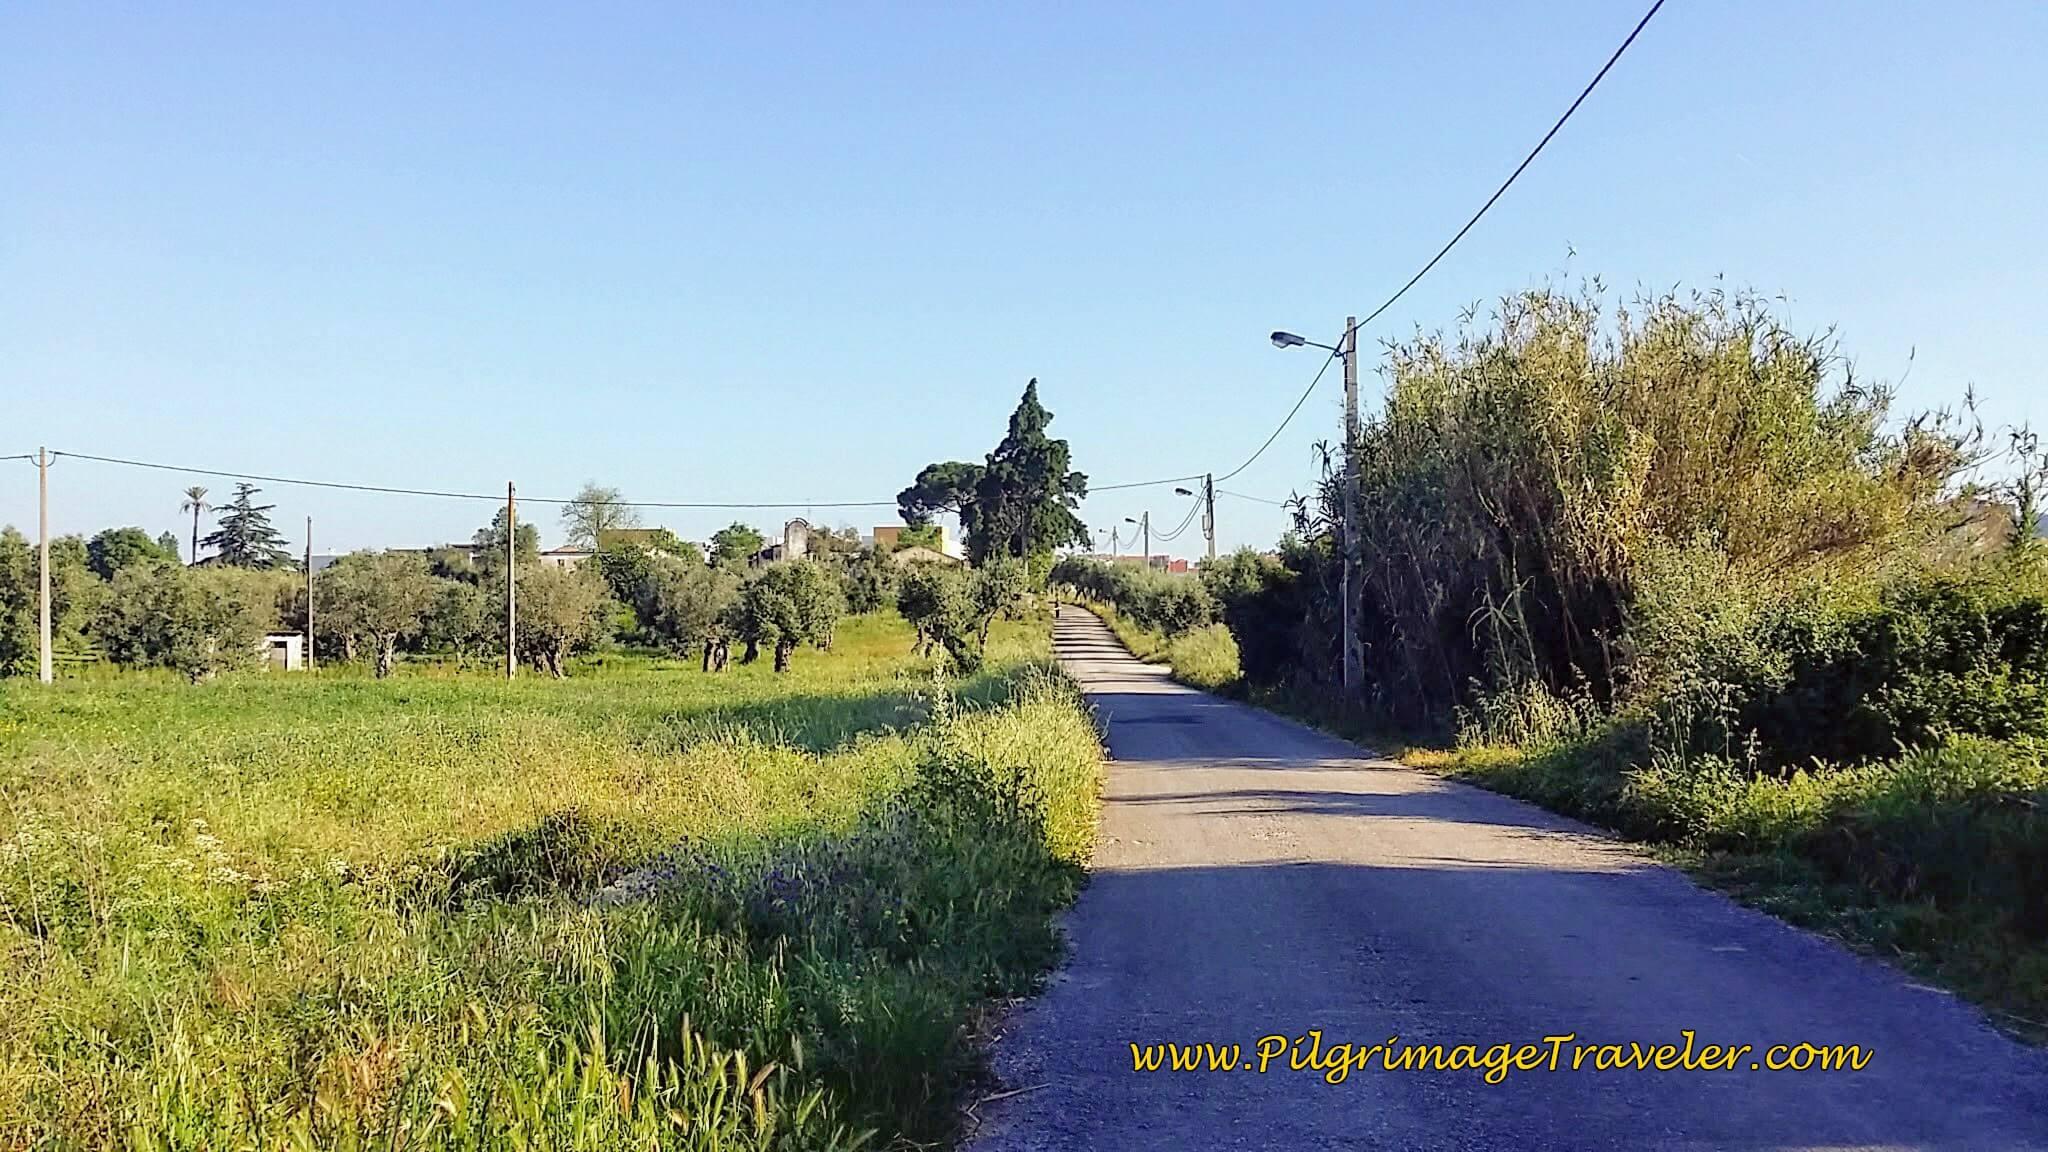 Walking on the Rua do Pedregoso just before Vila Nova da Barquinha, Portugal